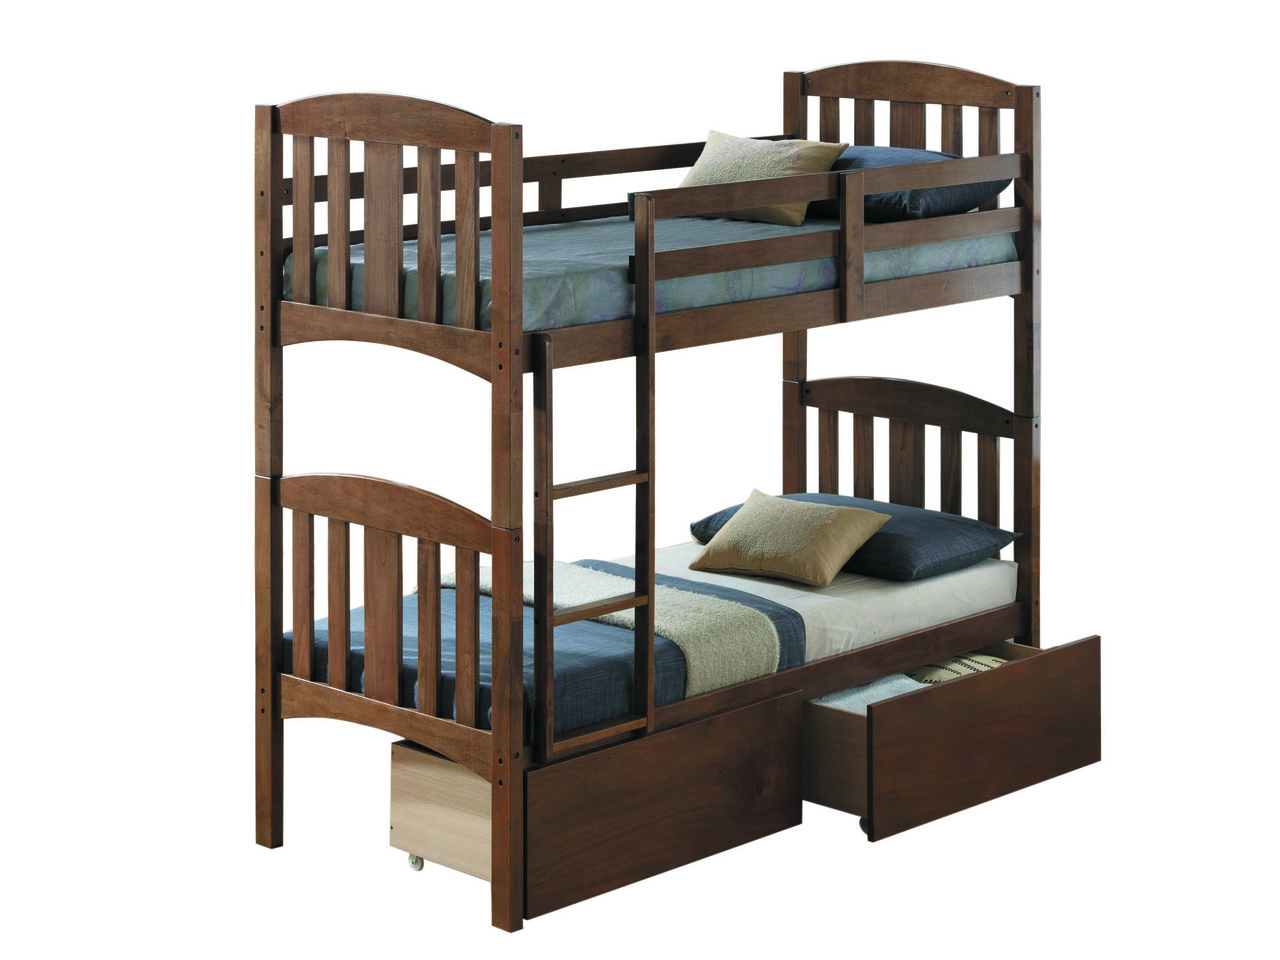 Кровать Мальвина двухъярусная цвет Рустикаль  (Domini TM)